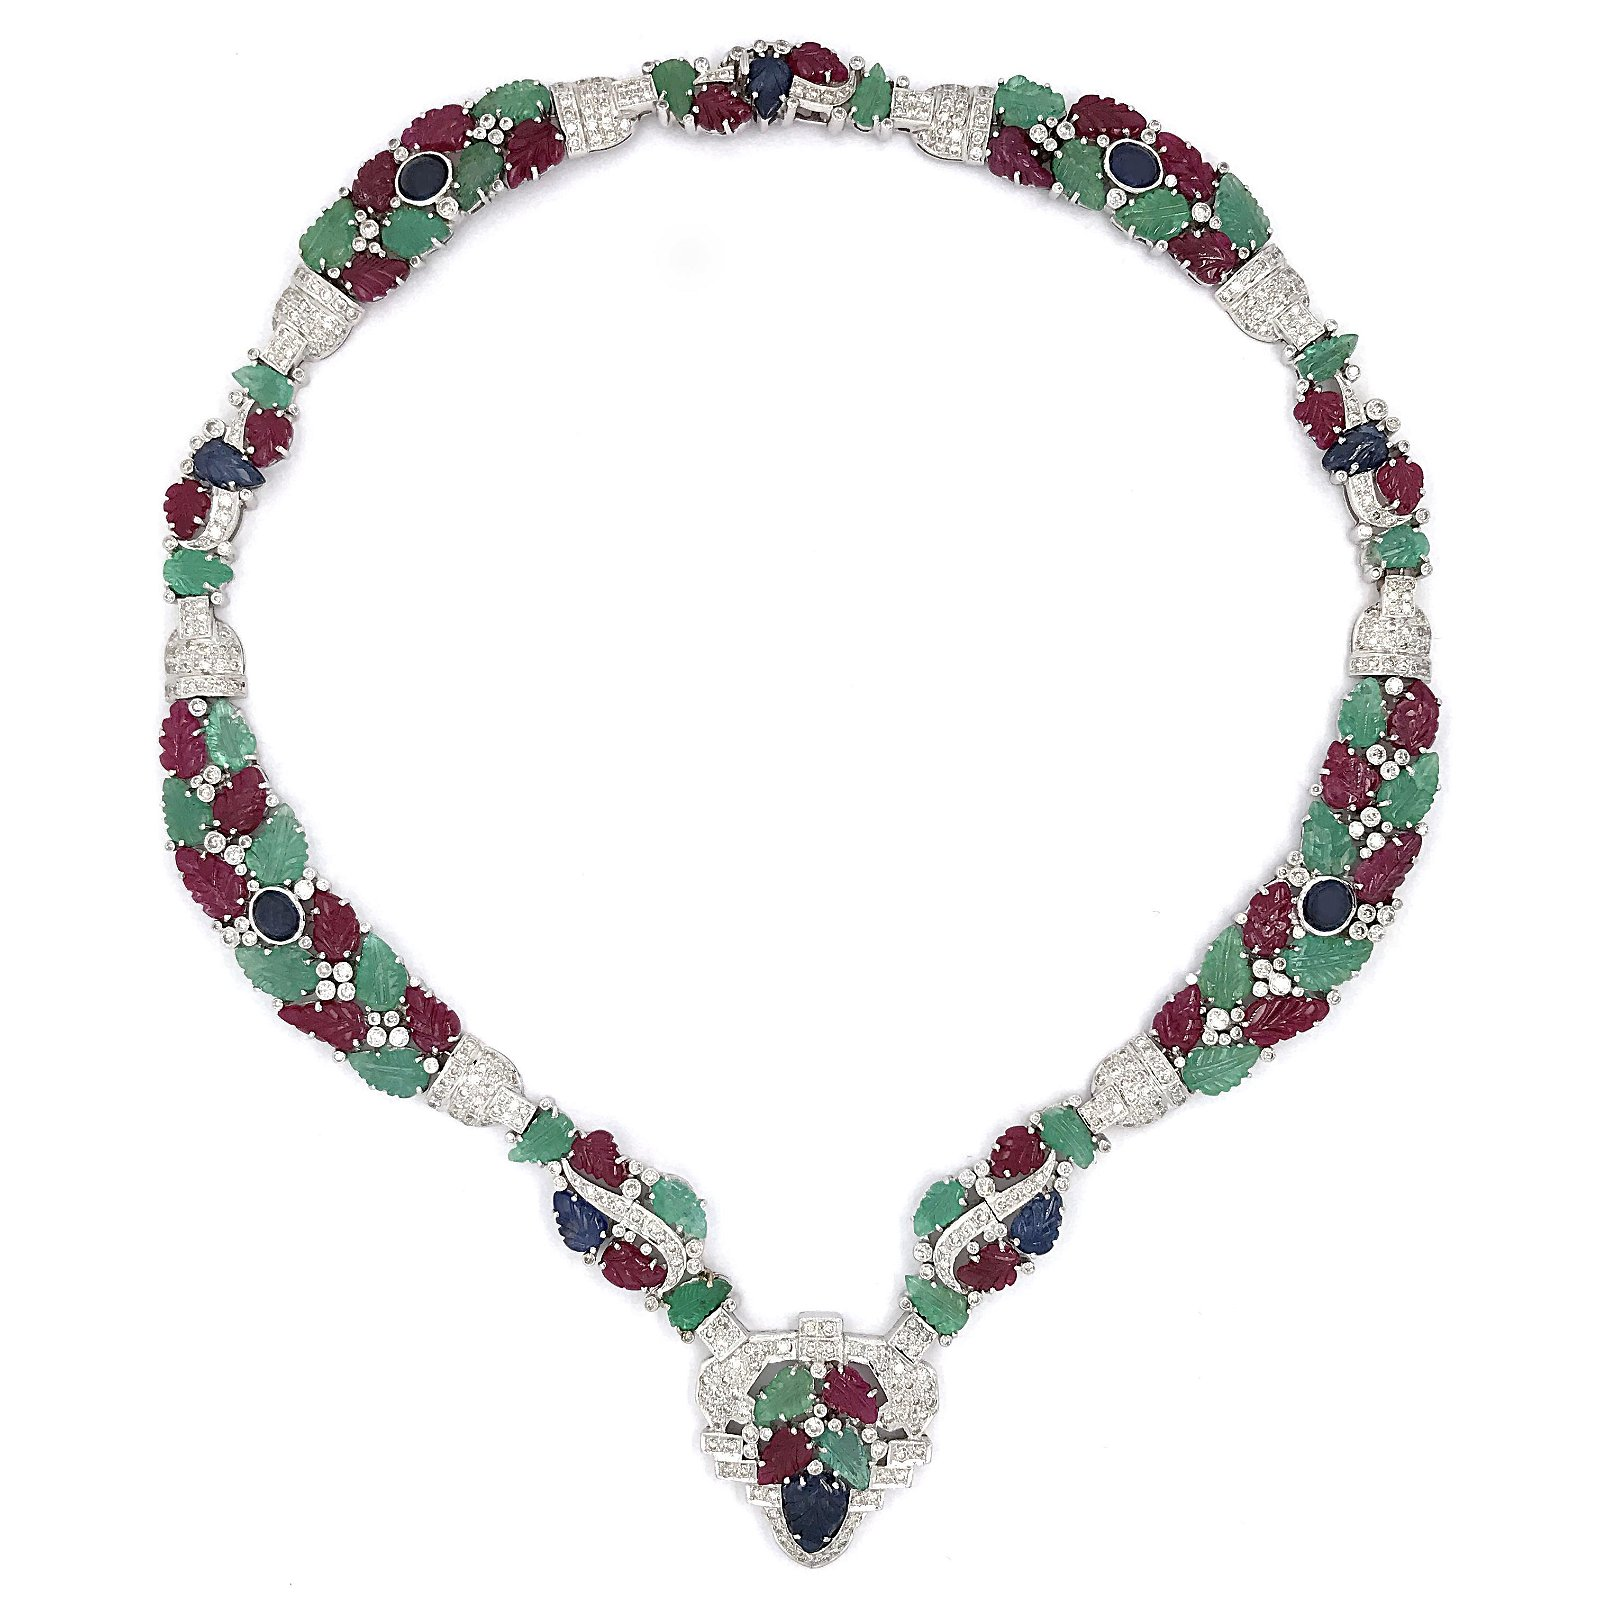 18K White Gold Tutti Frutti Diamond Necklace